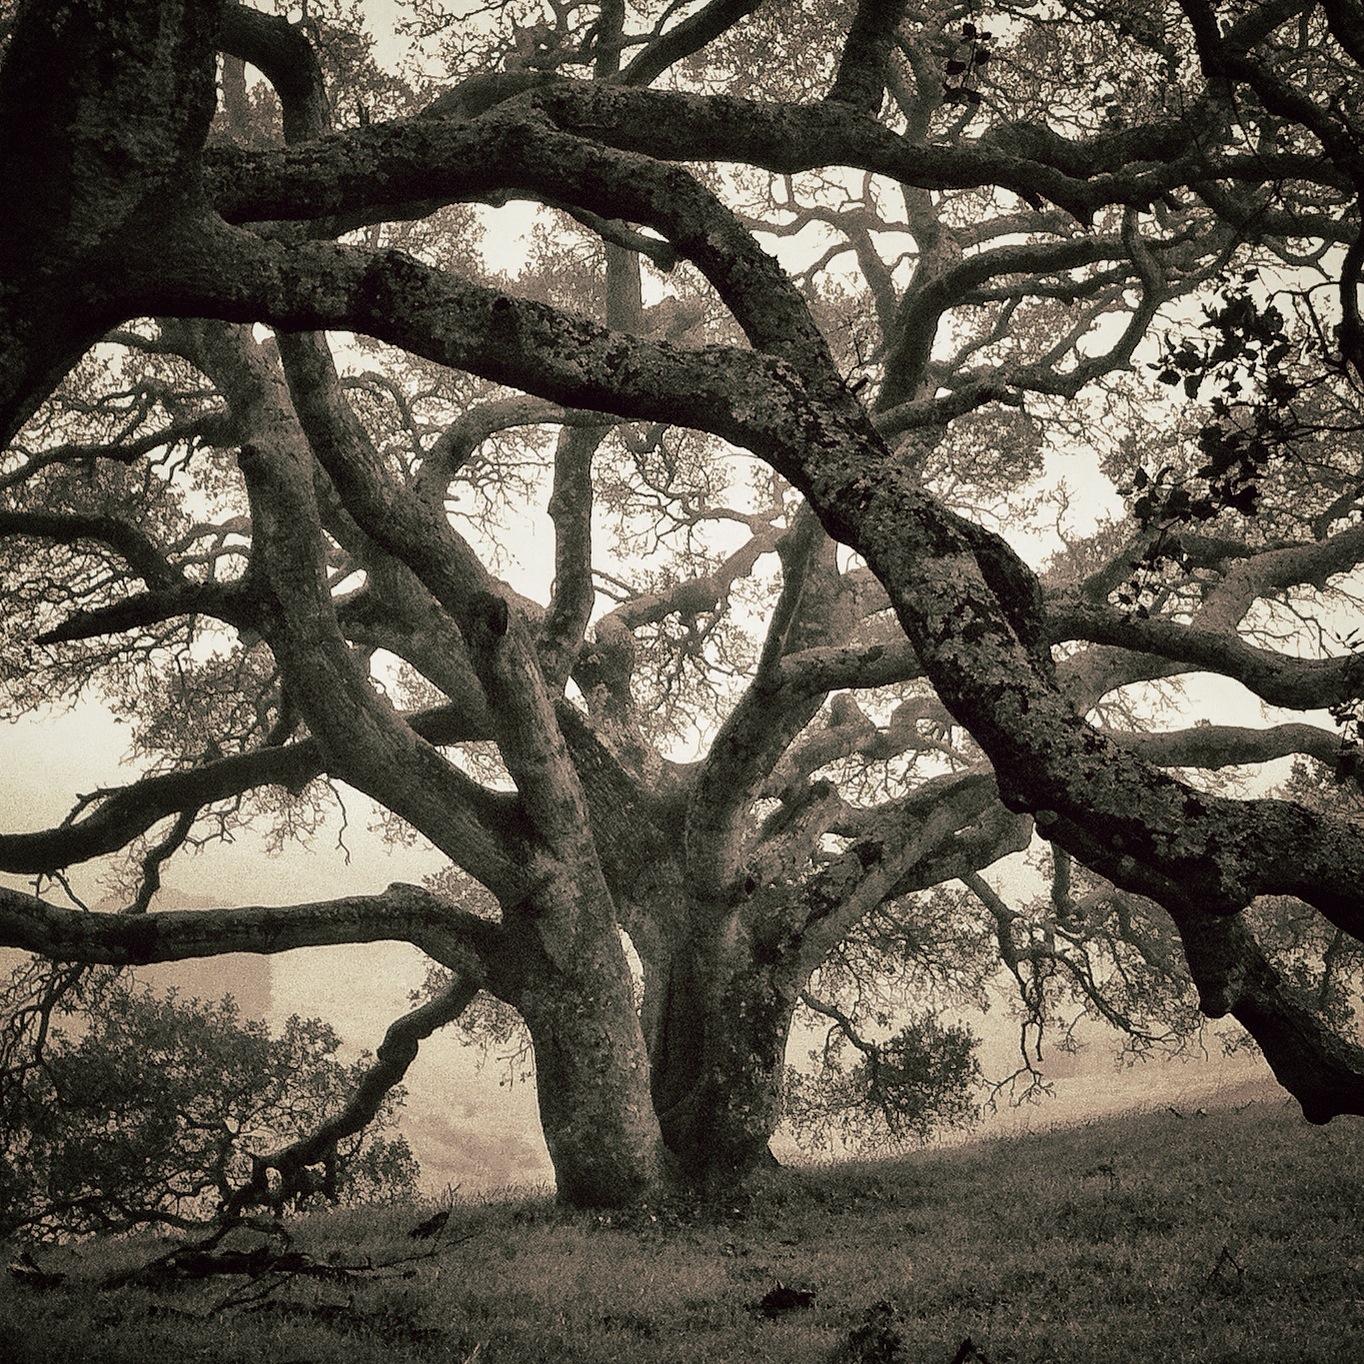 gray oaks